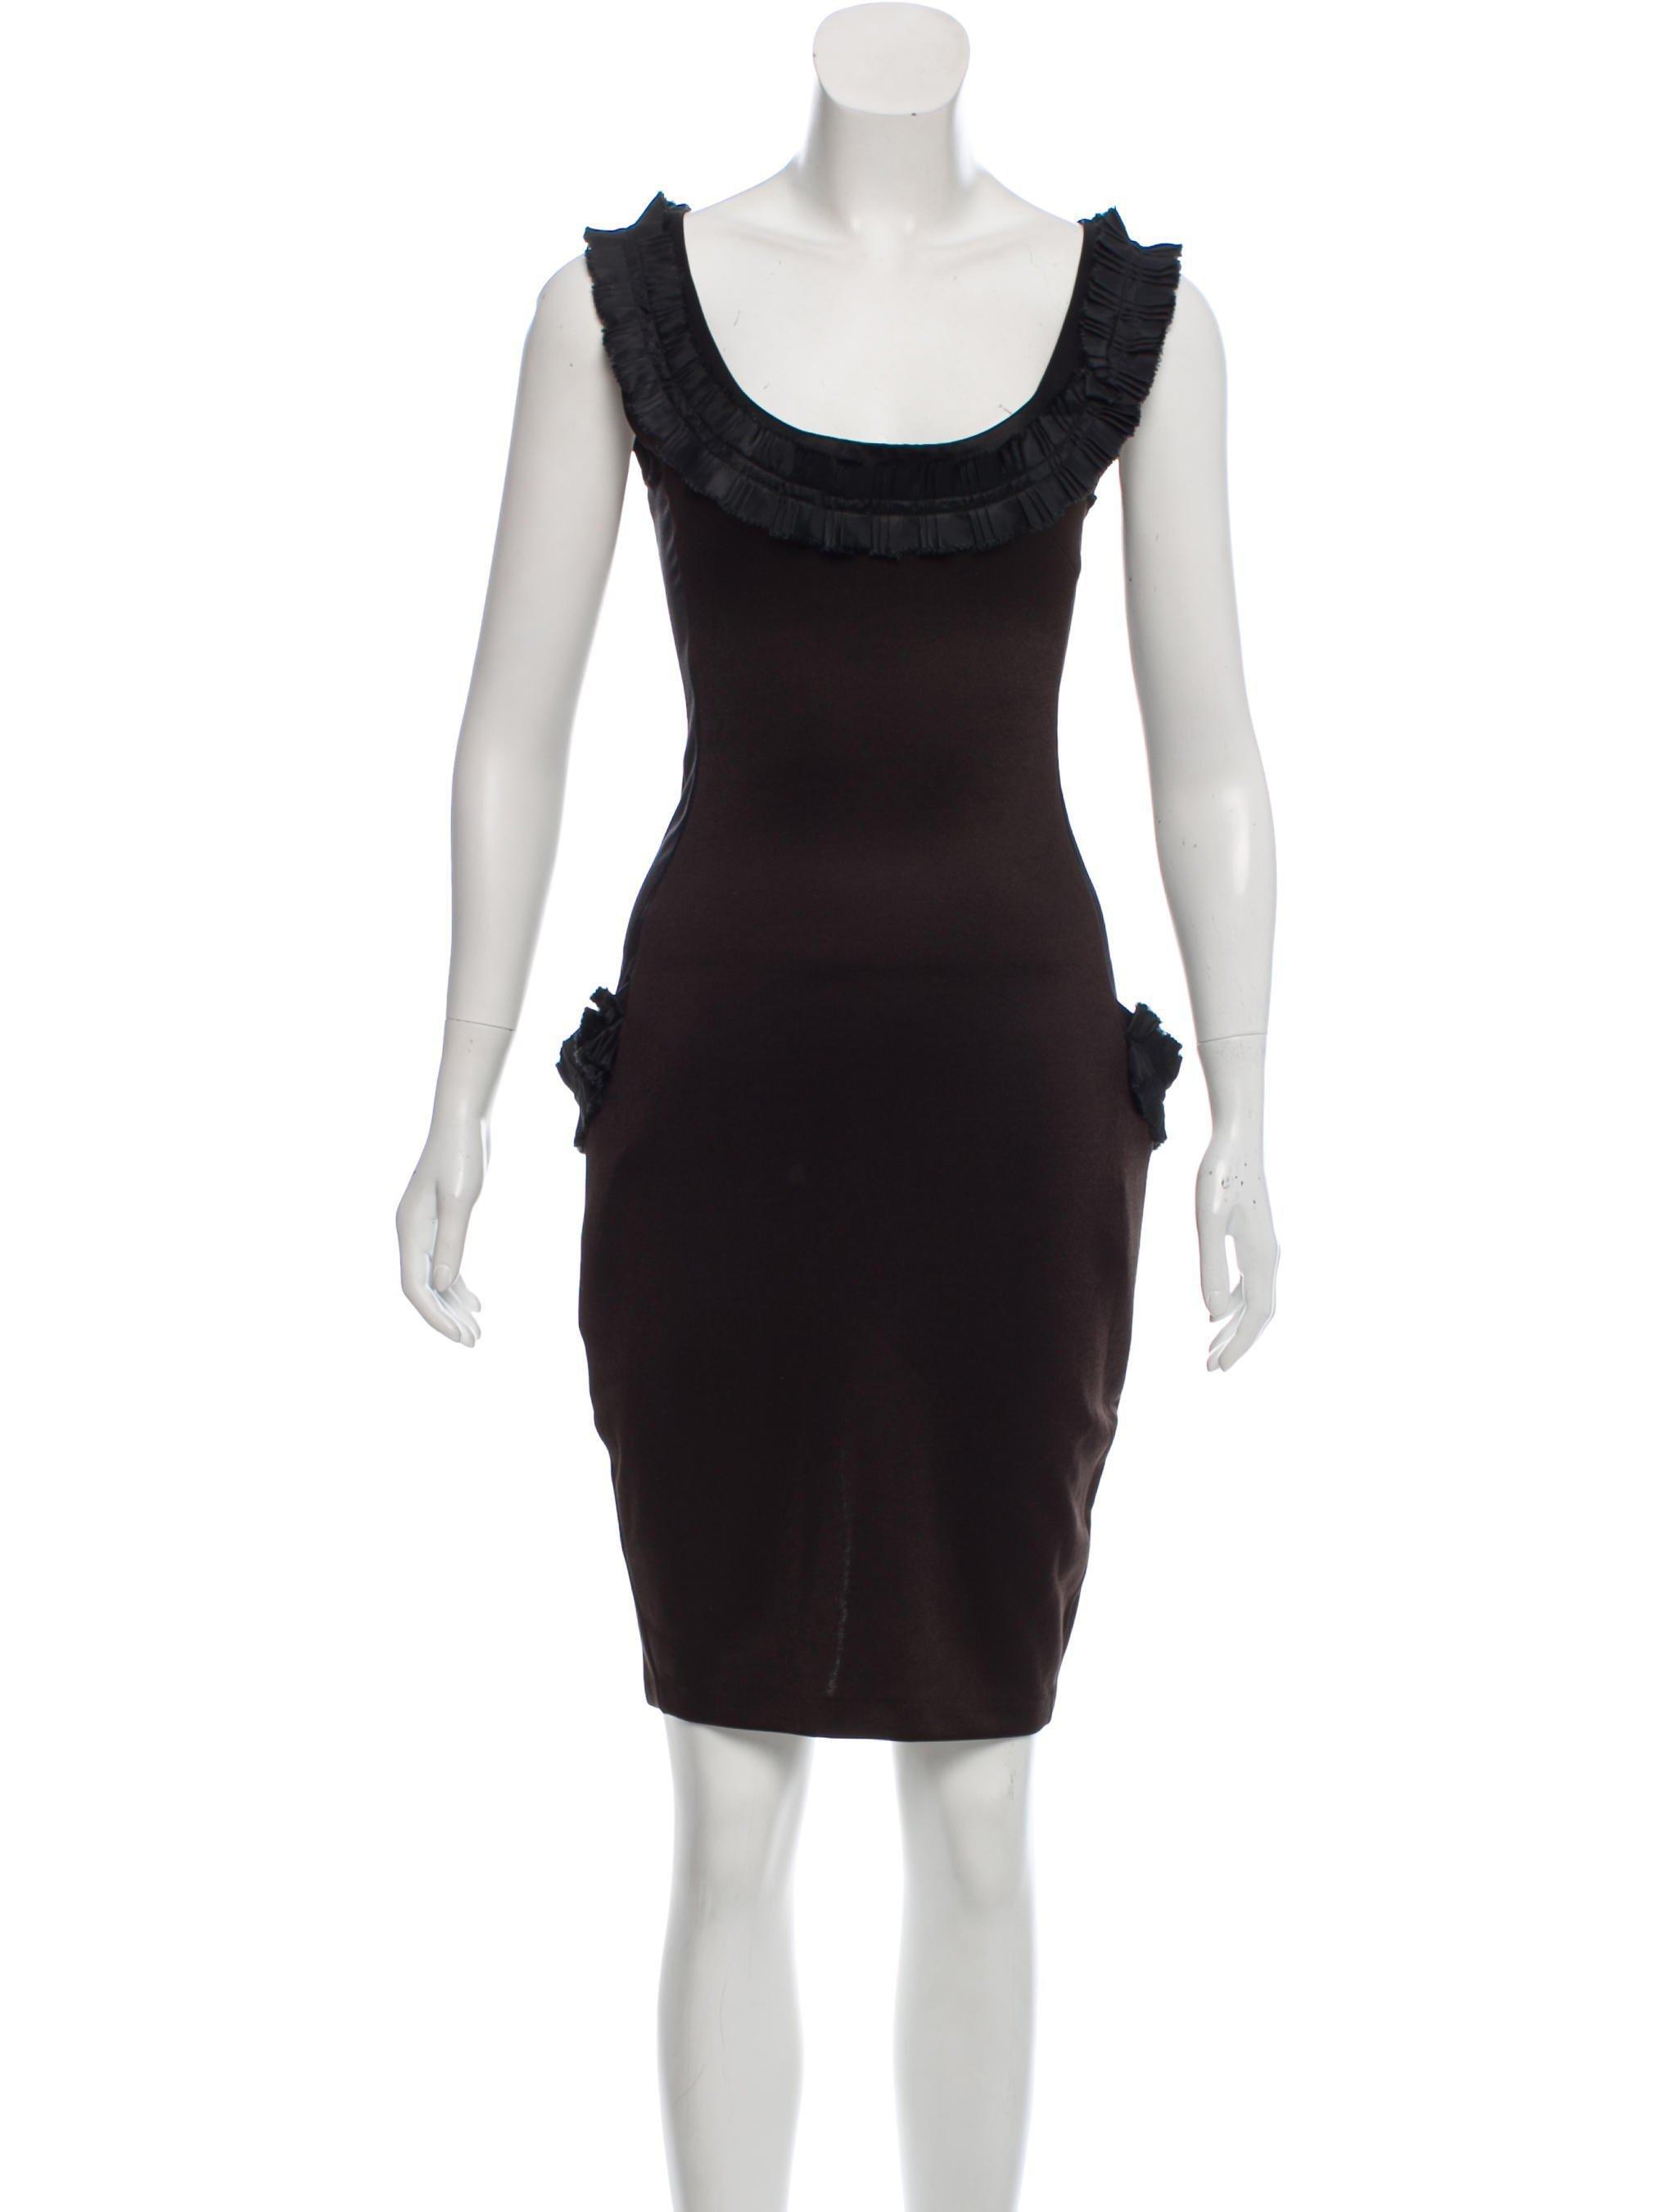 Blumarine Sleeveless Knee-Length Dress Clearance High Quality ZNonV